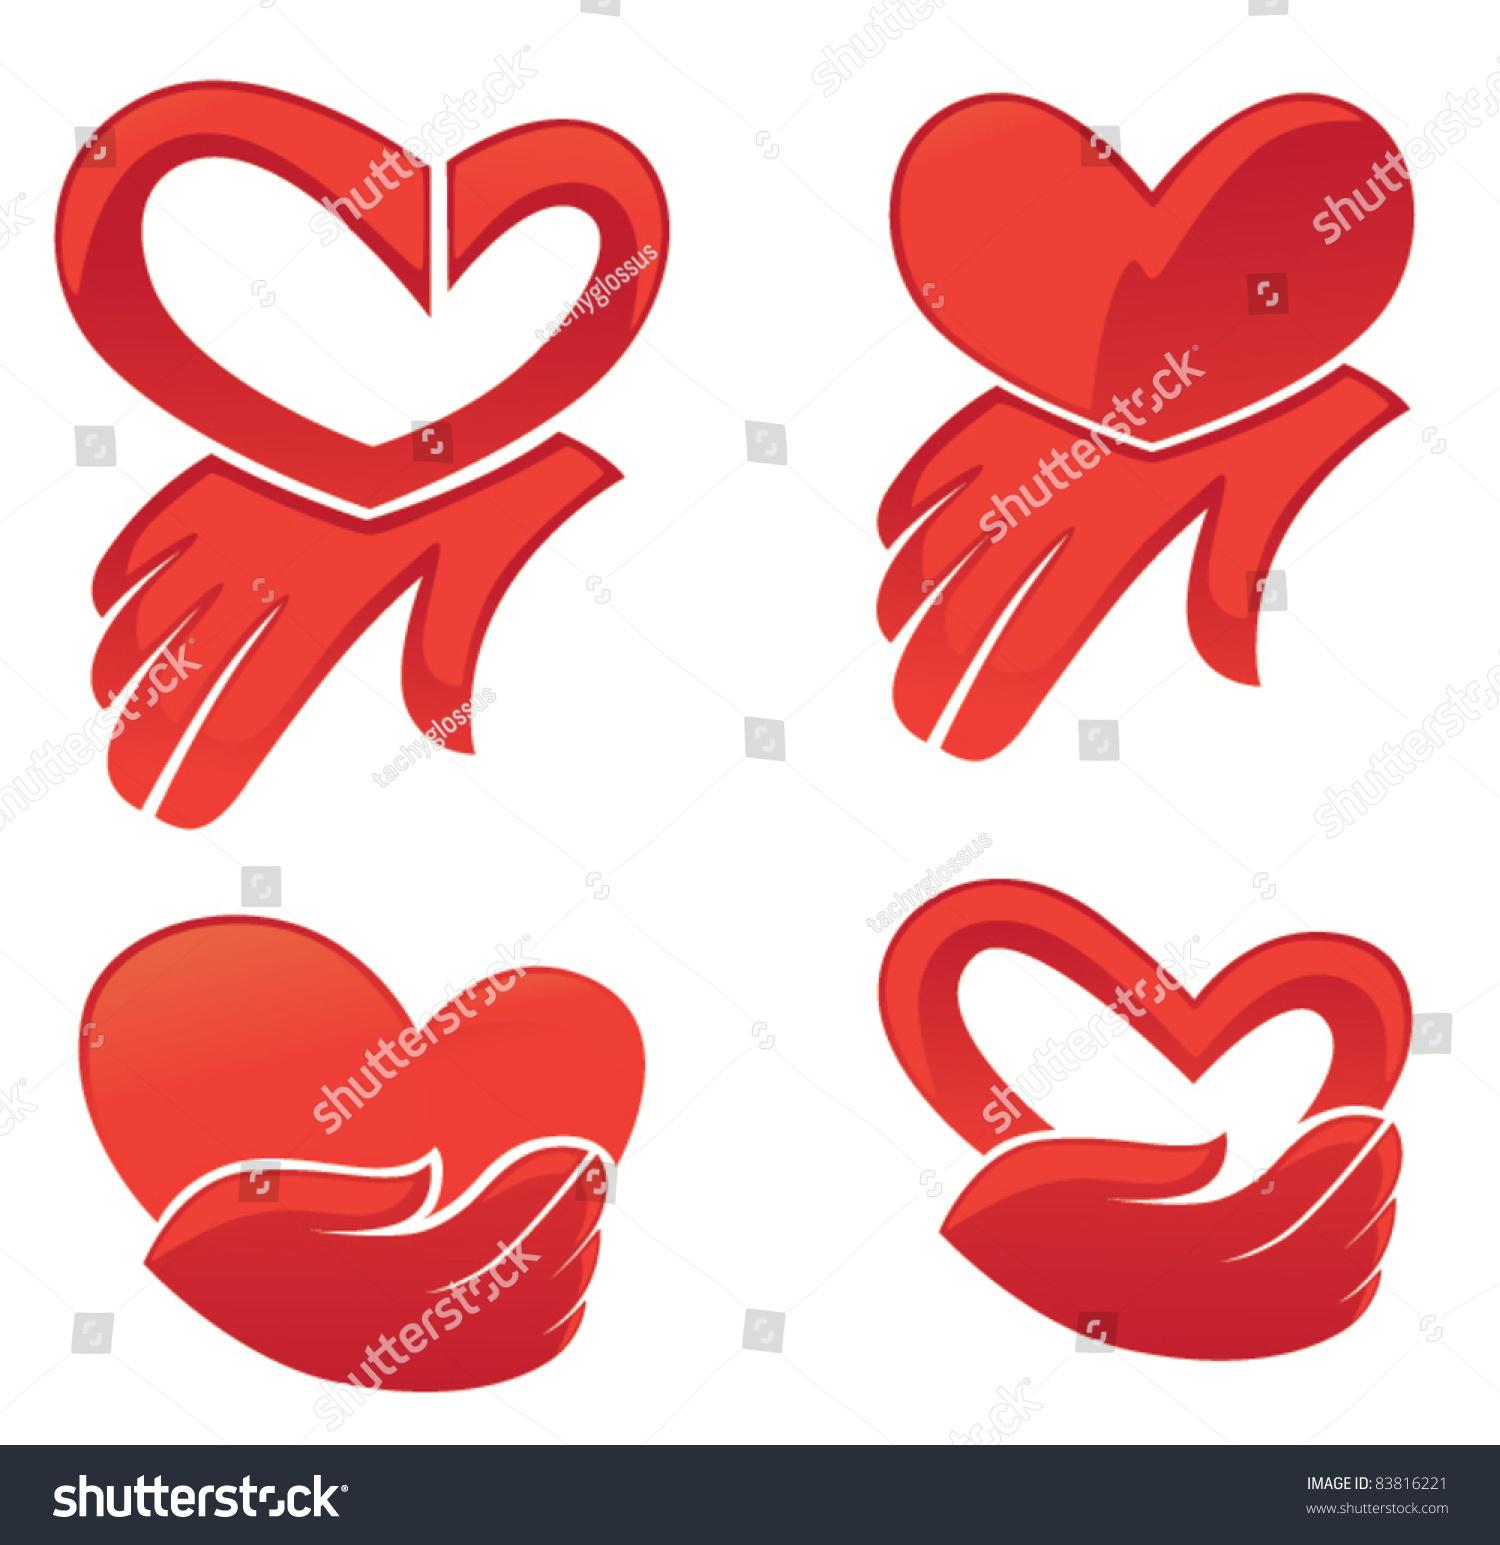 Vector collection hearts symbols stock vector 83816221 shutterstock vector collection of hearts symbols biocorpaavc